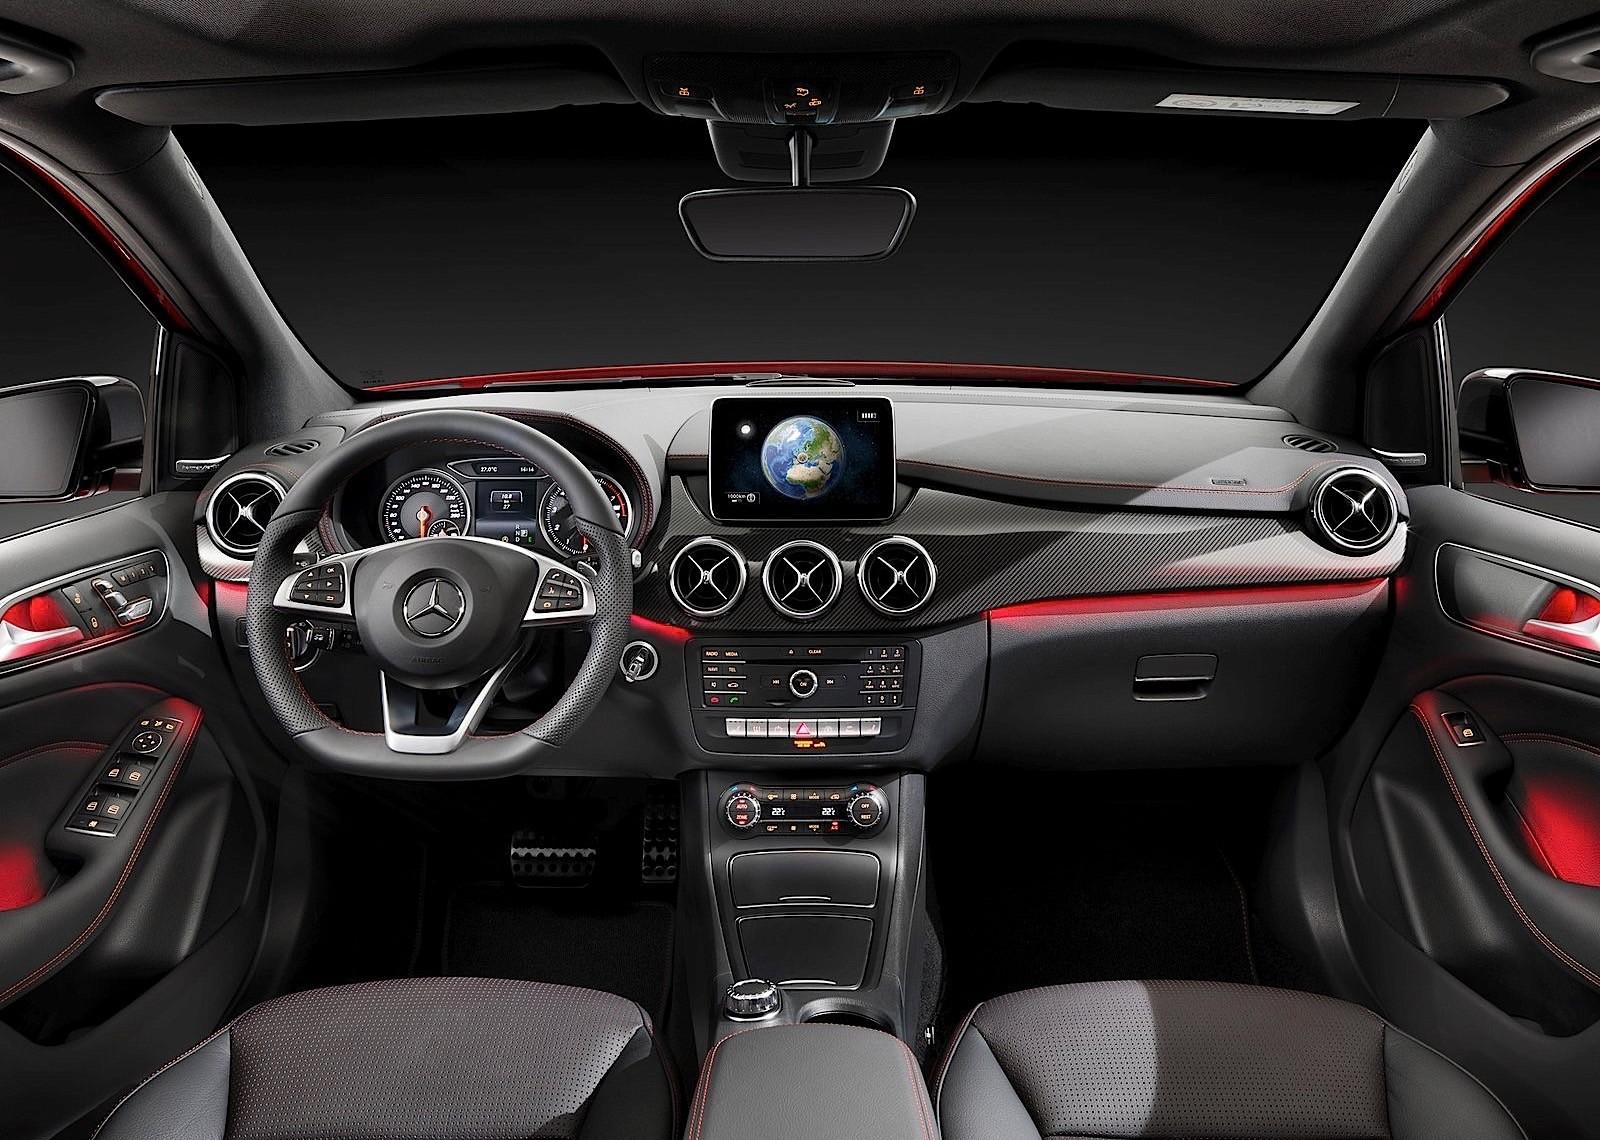 Mercedes Benz Rims >> MERCEDES BENZ B Class (W246) specs & photos - 2014, 2015, 2016, 2017, 2018 - autoevolution